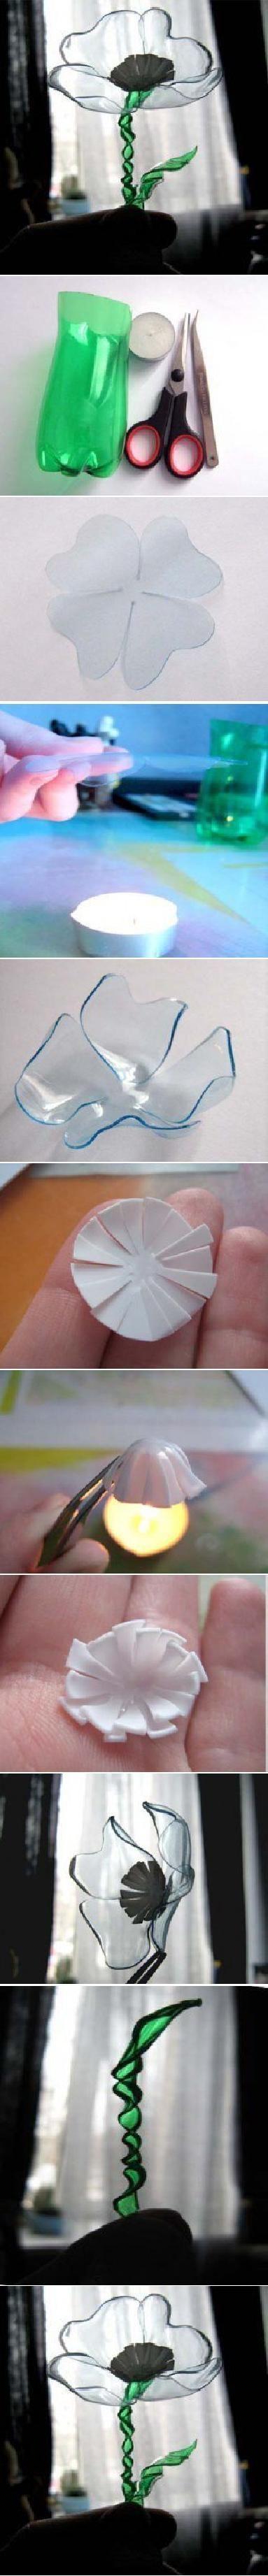 DIY Flower from a Plastic Bottle: